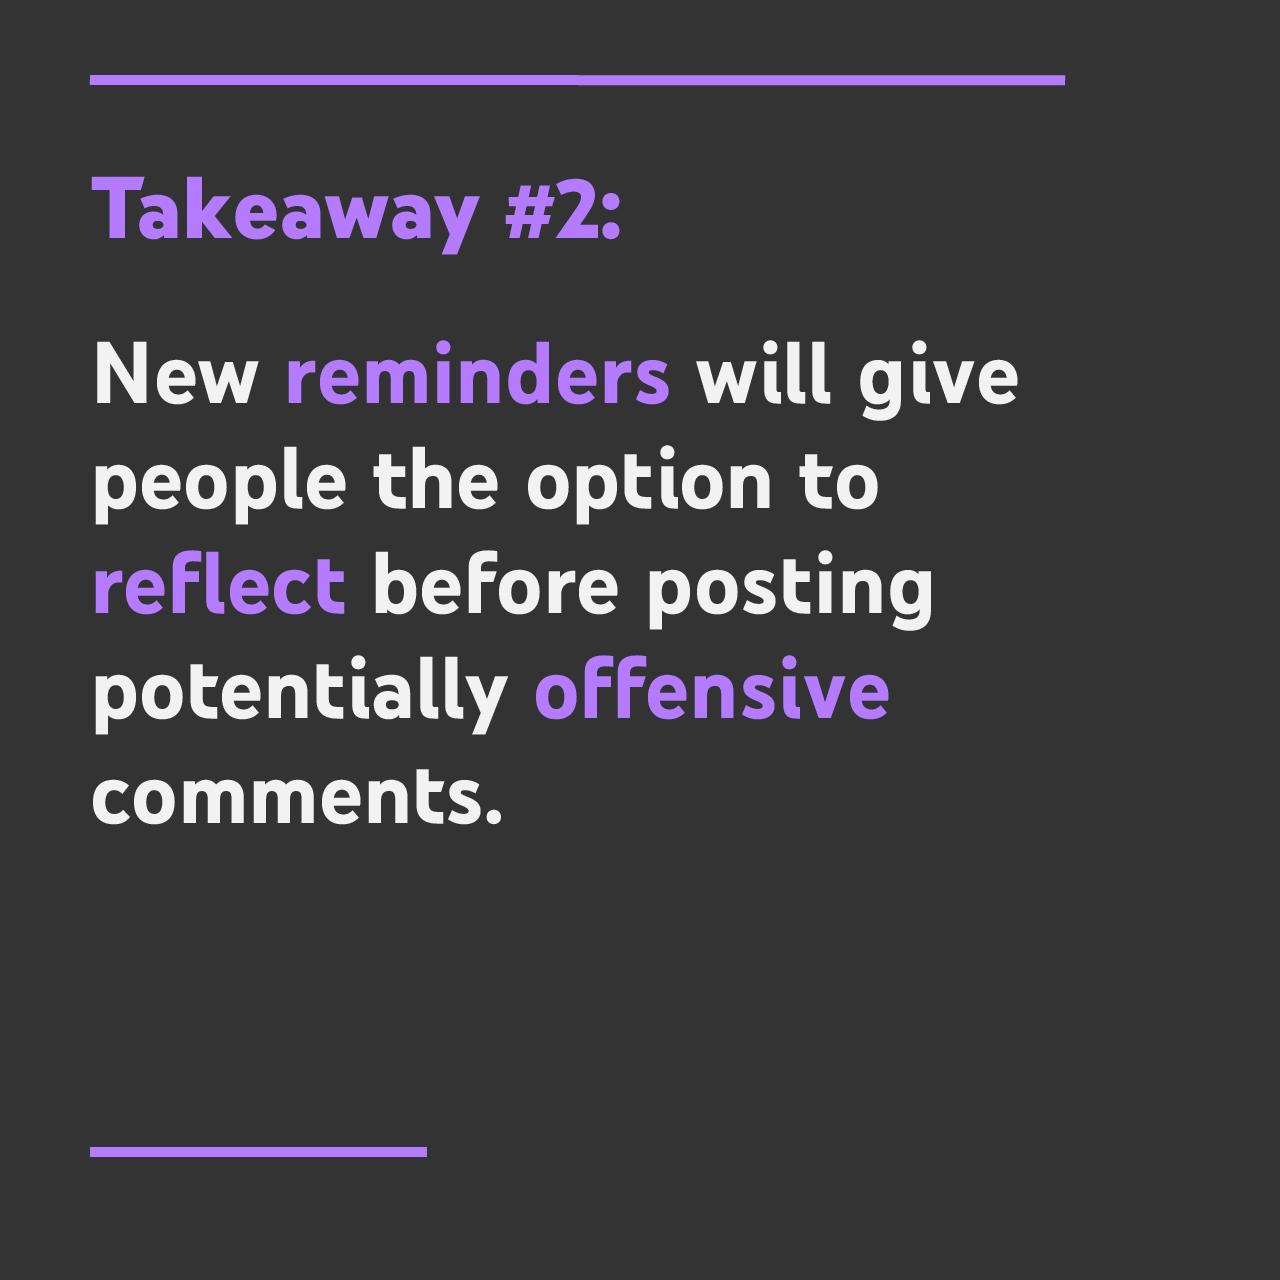 takeaway #2